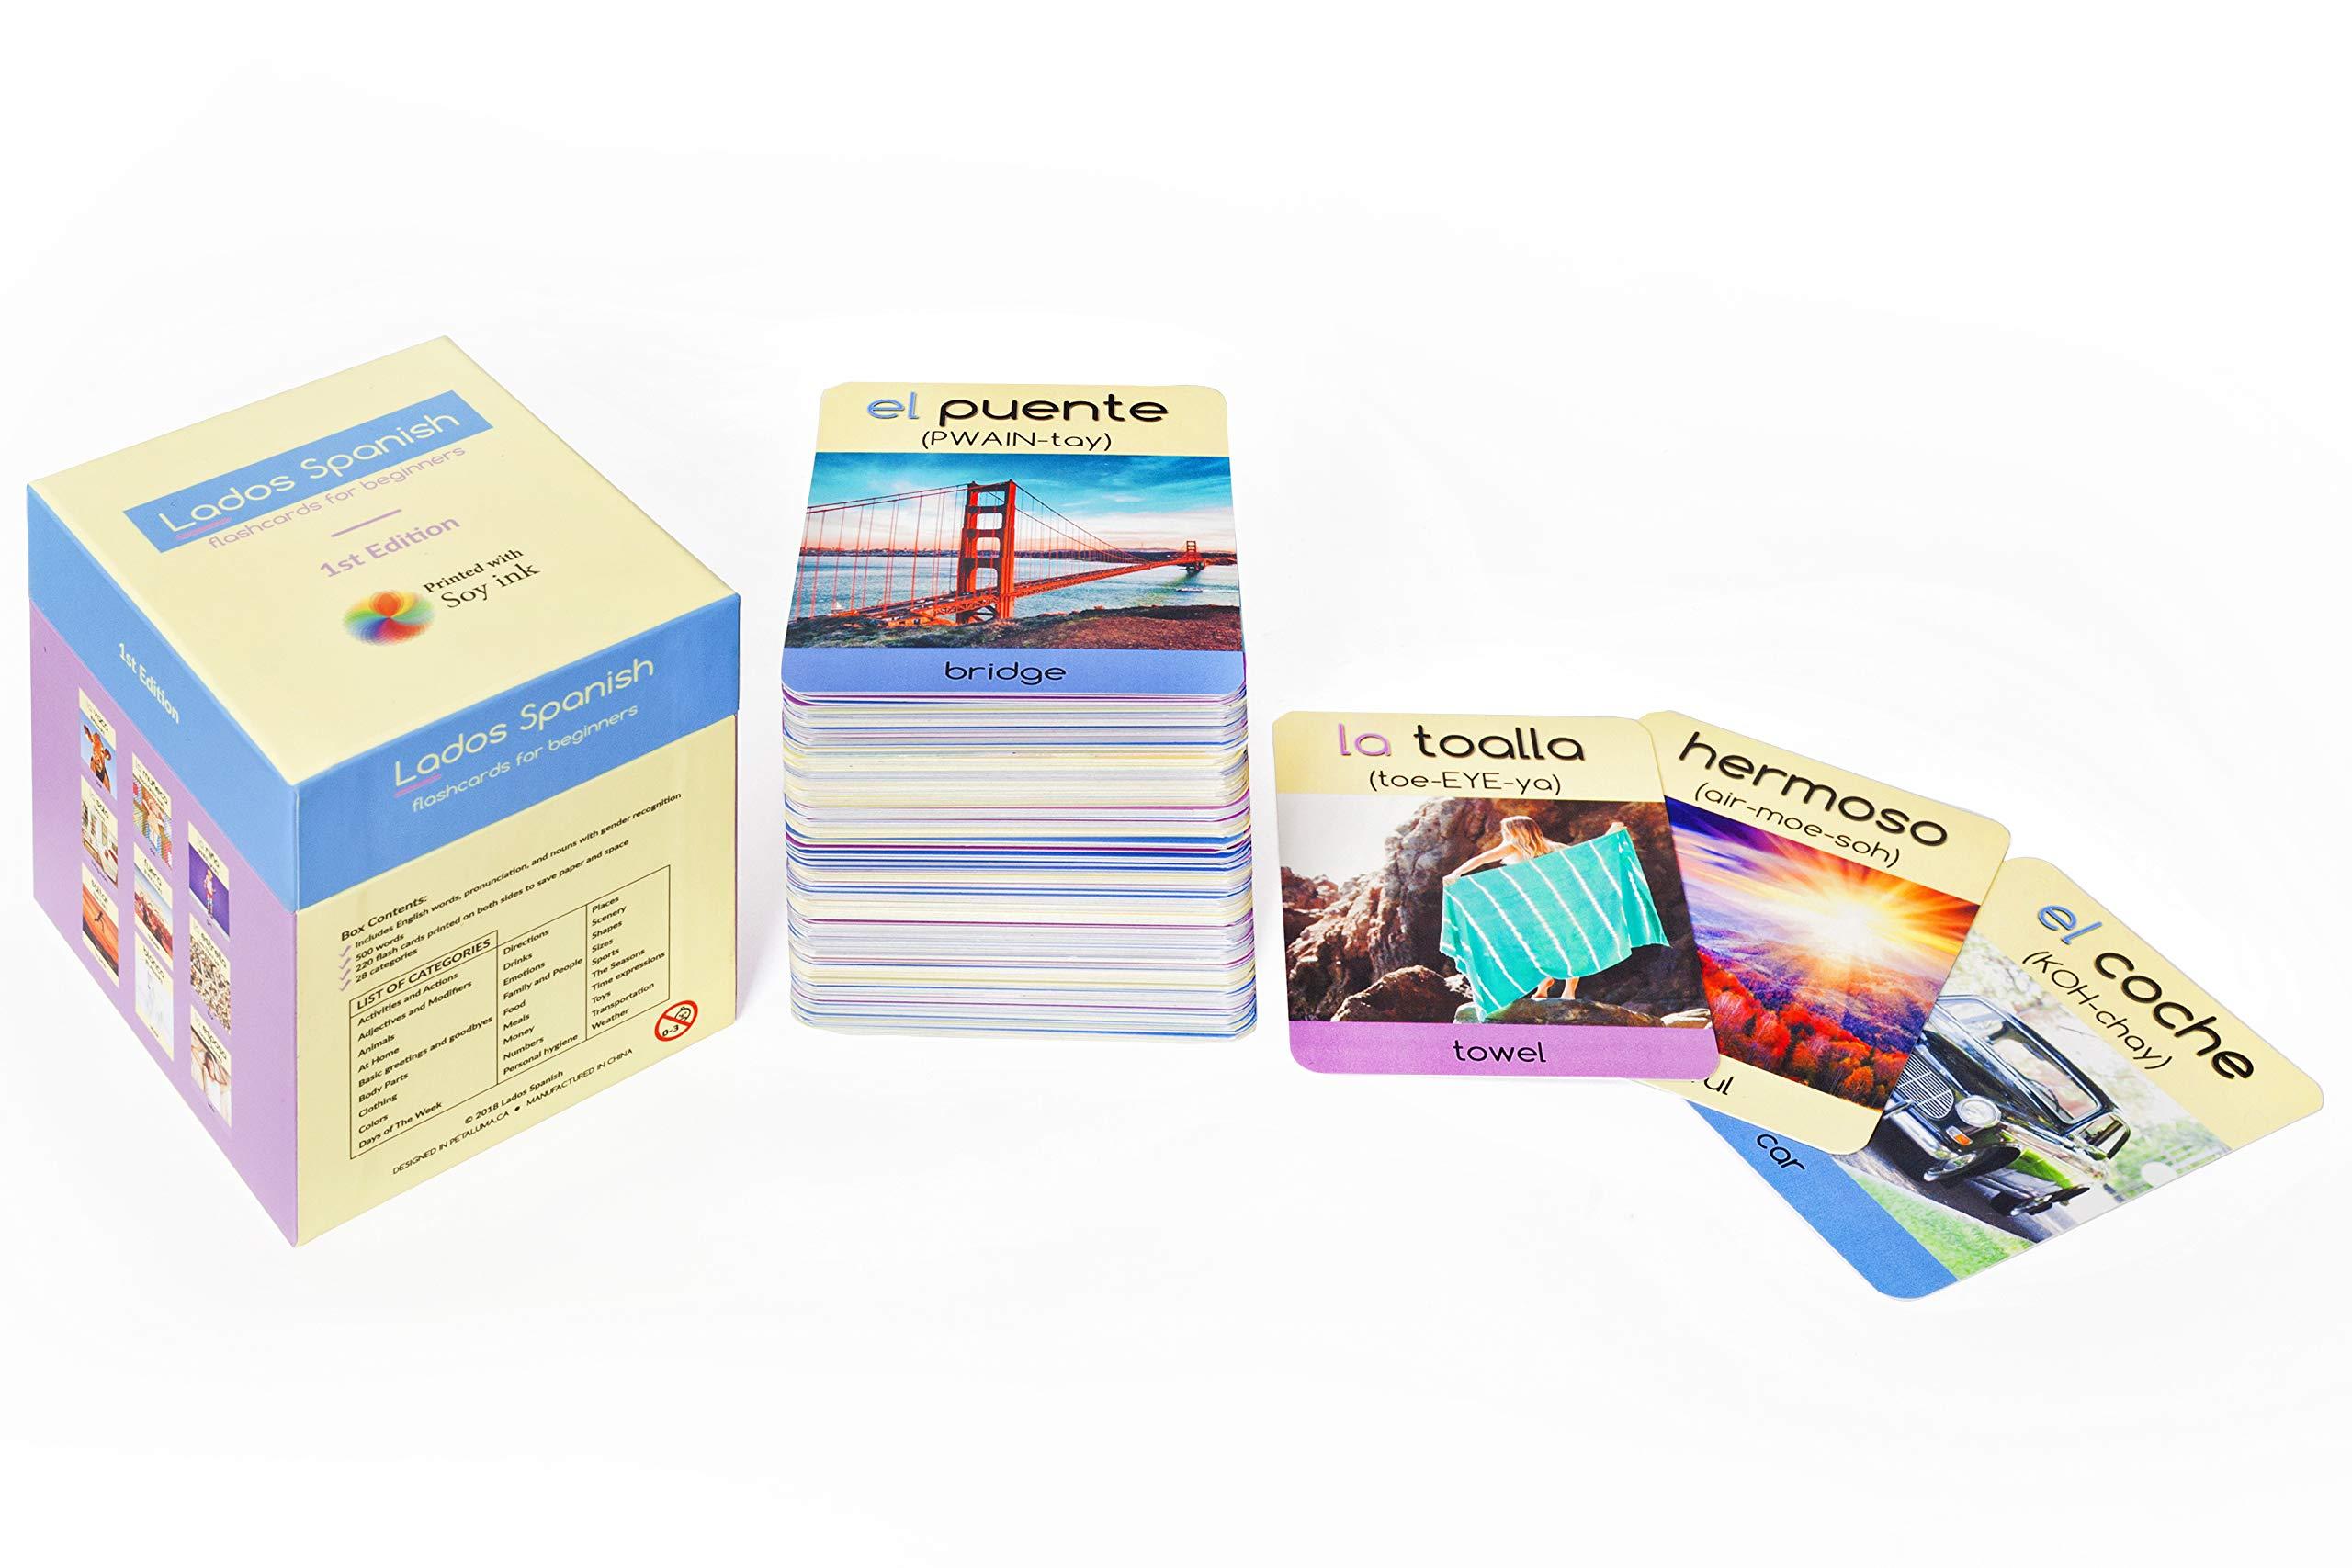 Lados Spanish- Spanish Flash Cards- Learn Basic Spanish- Spanish for Adults and Kids-Spanish flashcard Program- Spanish Vocabulary-Basic Spanish-Beginner Spanish